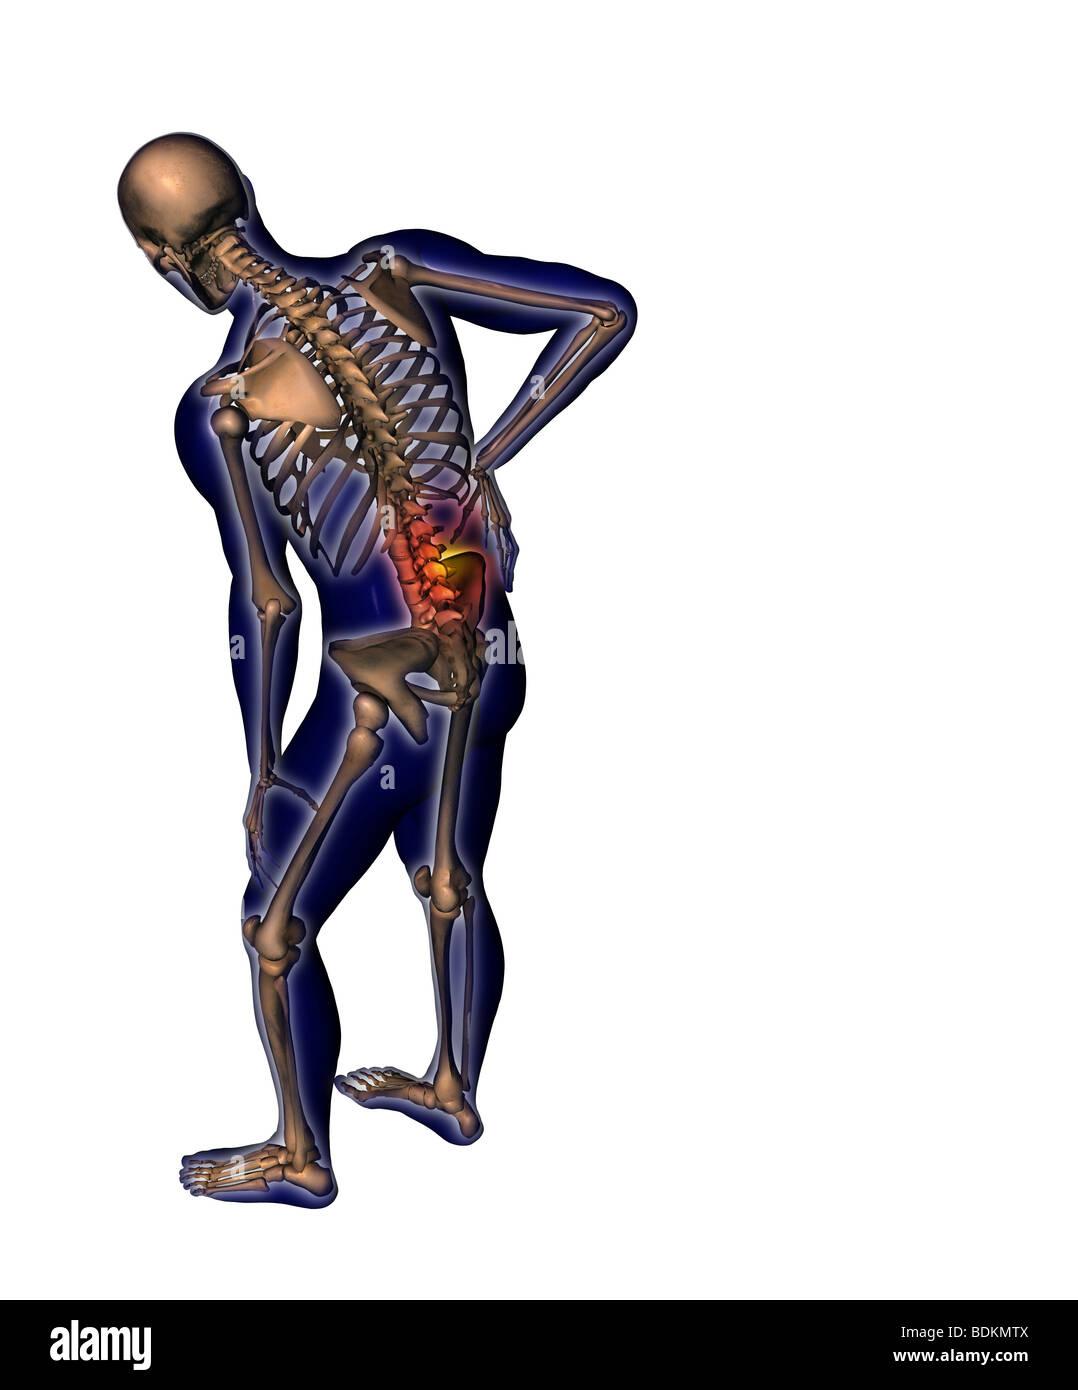 Human Anatomy Illustration Showing Stock Photo 25634362 Alamy